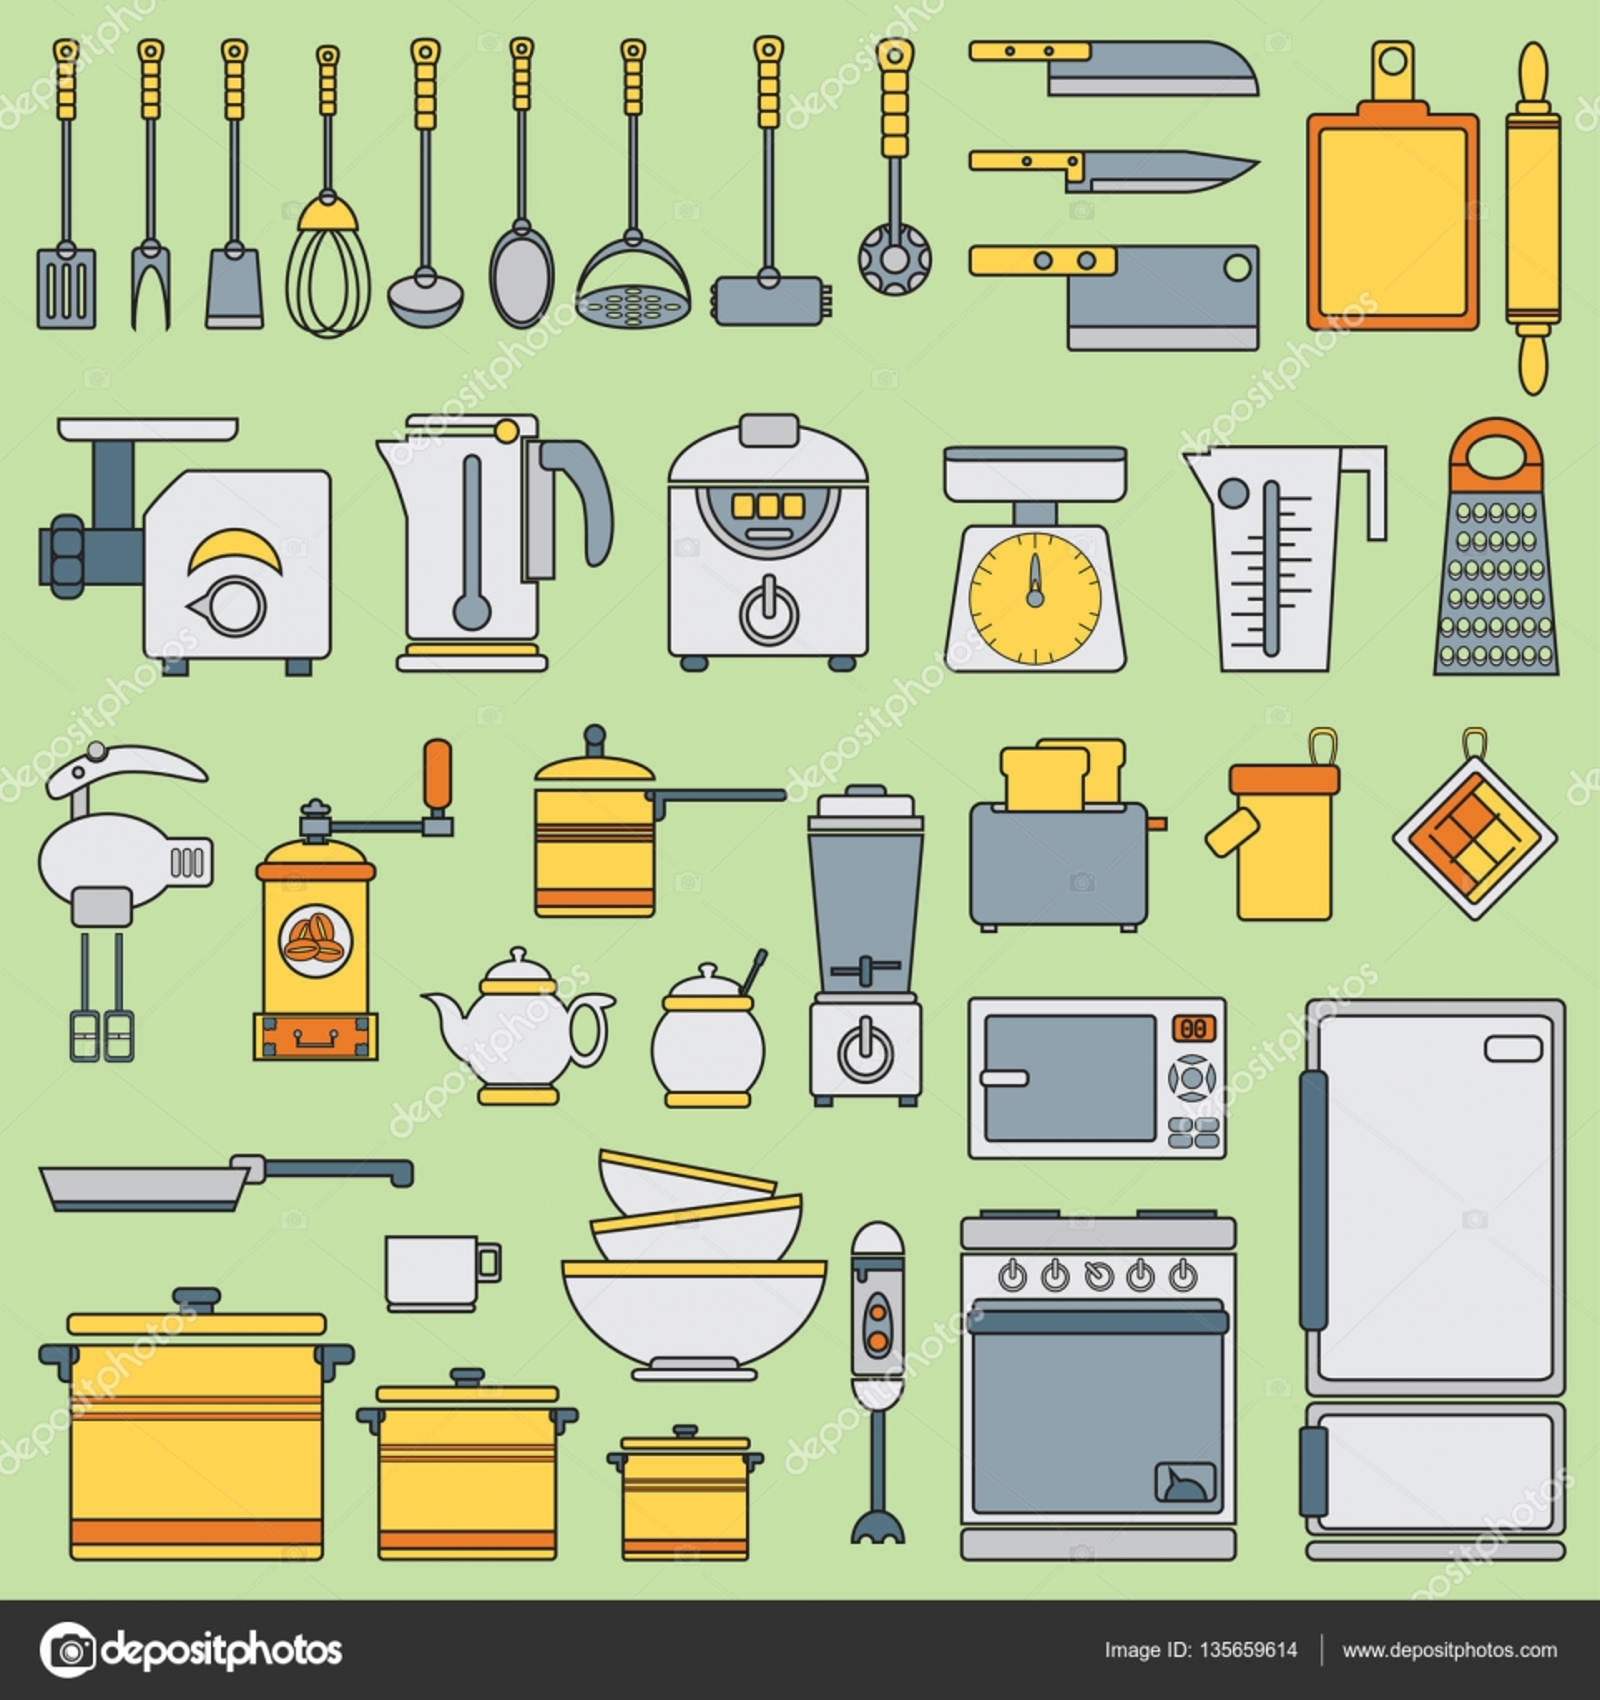 L nea vector plano utensilios de cocina set de iconos for Programas de dibujo de cocinas gratis